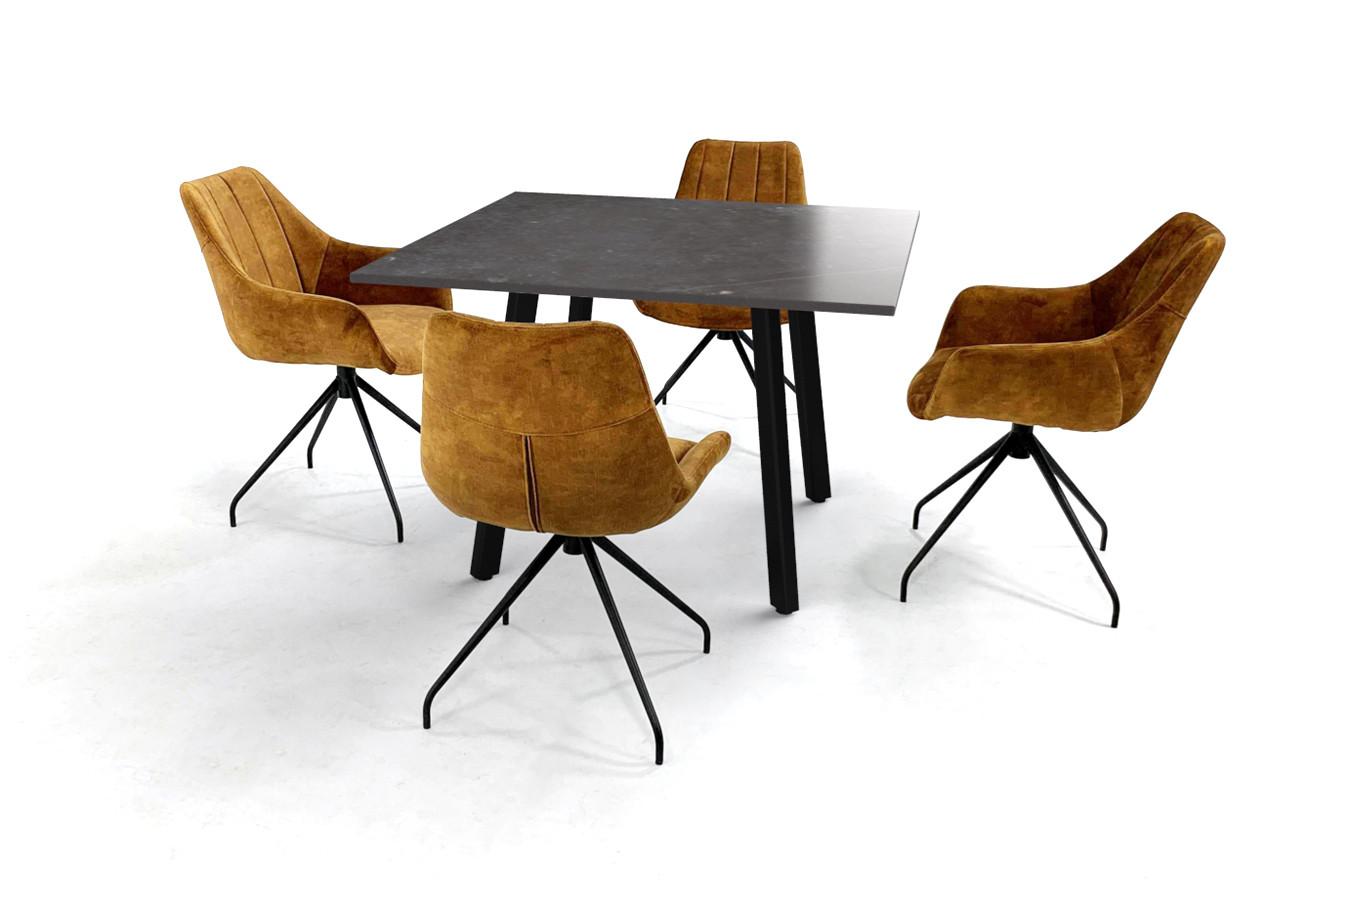 Vierkante eettafel met Dekton blad, Imperia onderstel en velvet stoelen